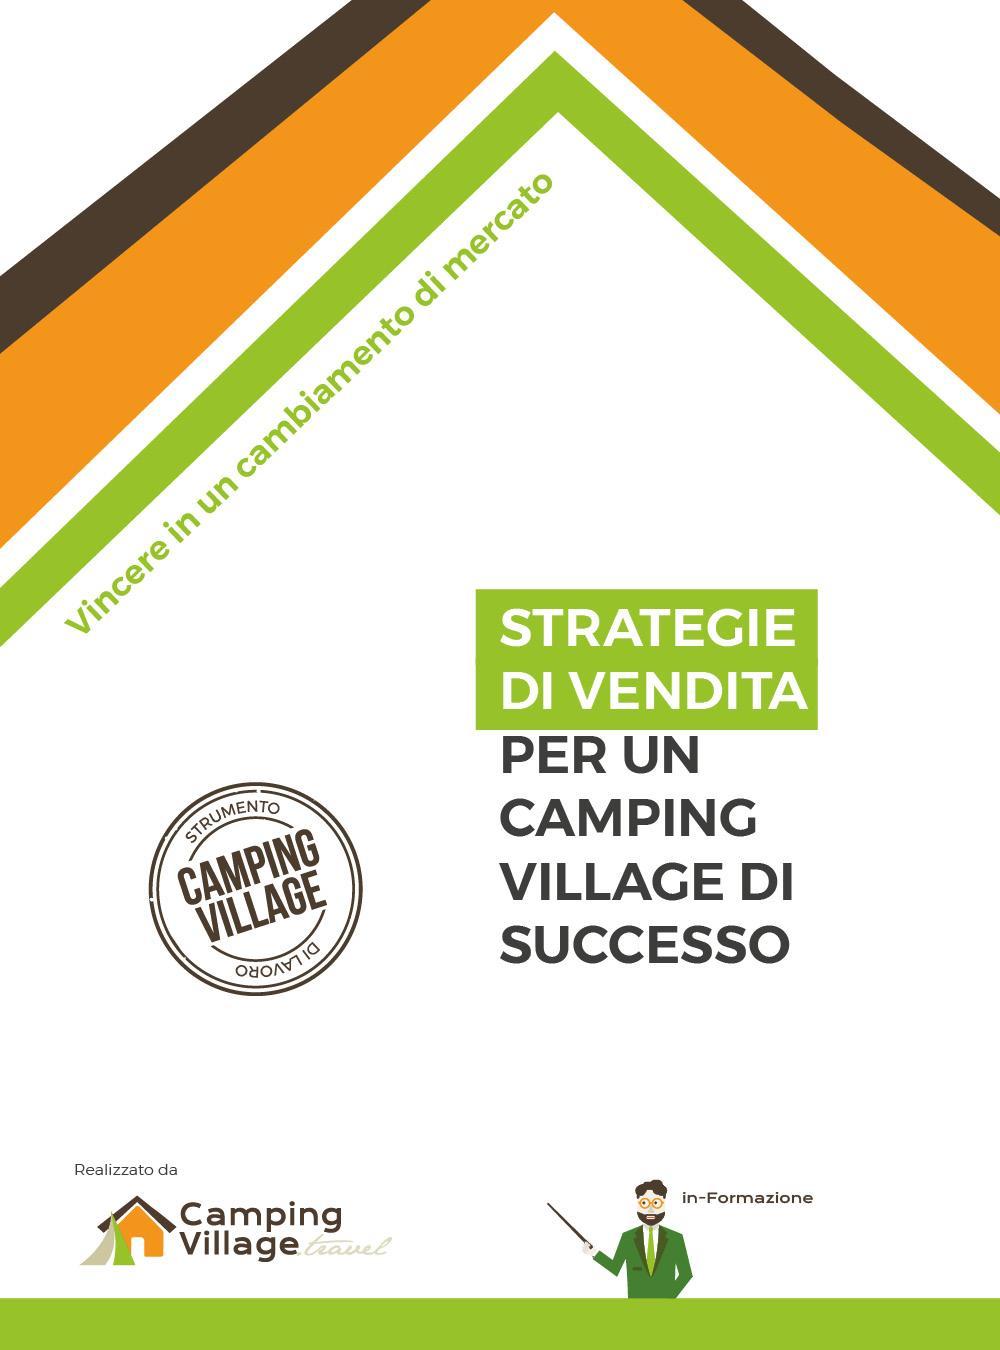 Strategie di vendita per un Camping Village di successo